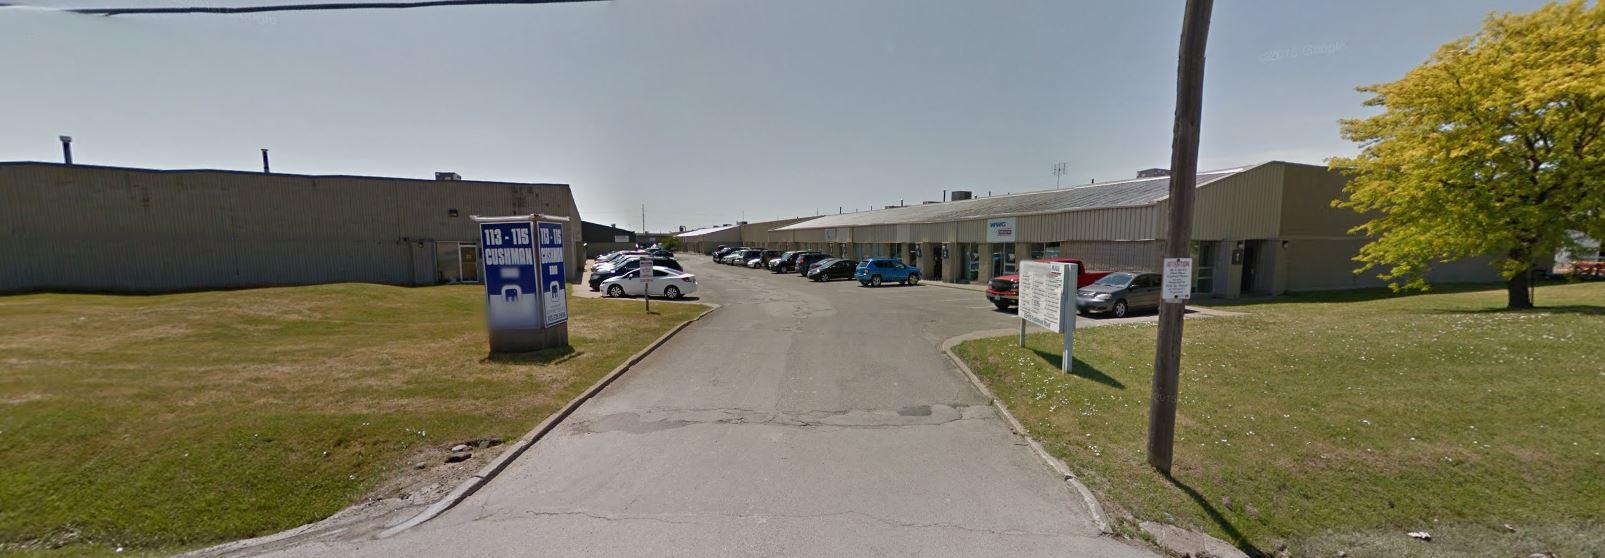 Cushman Industrial Mall